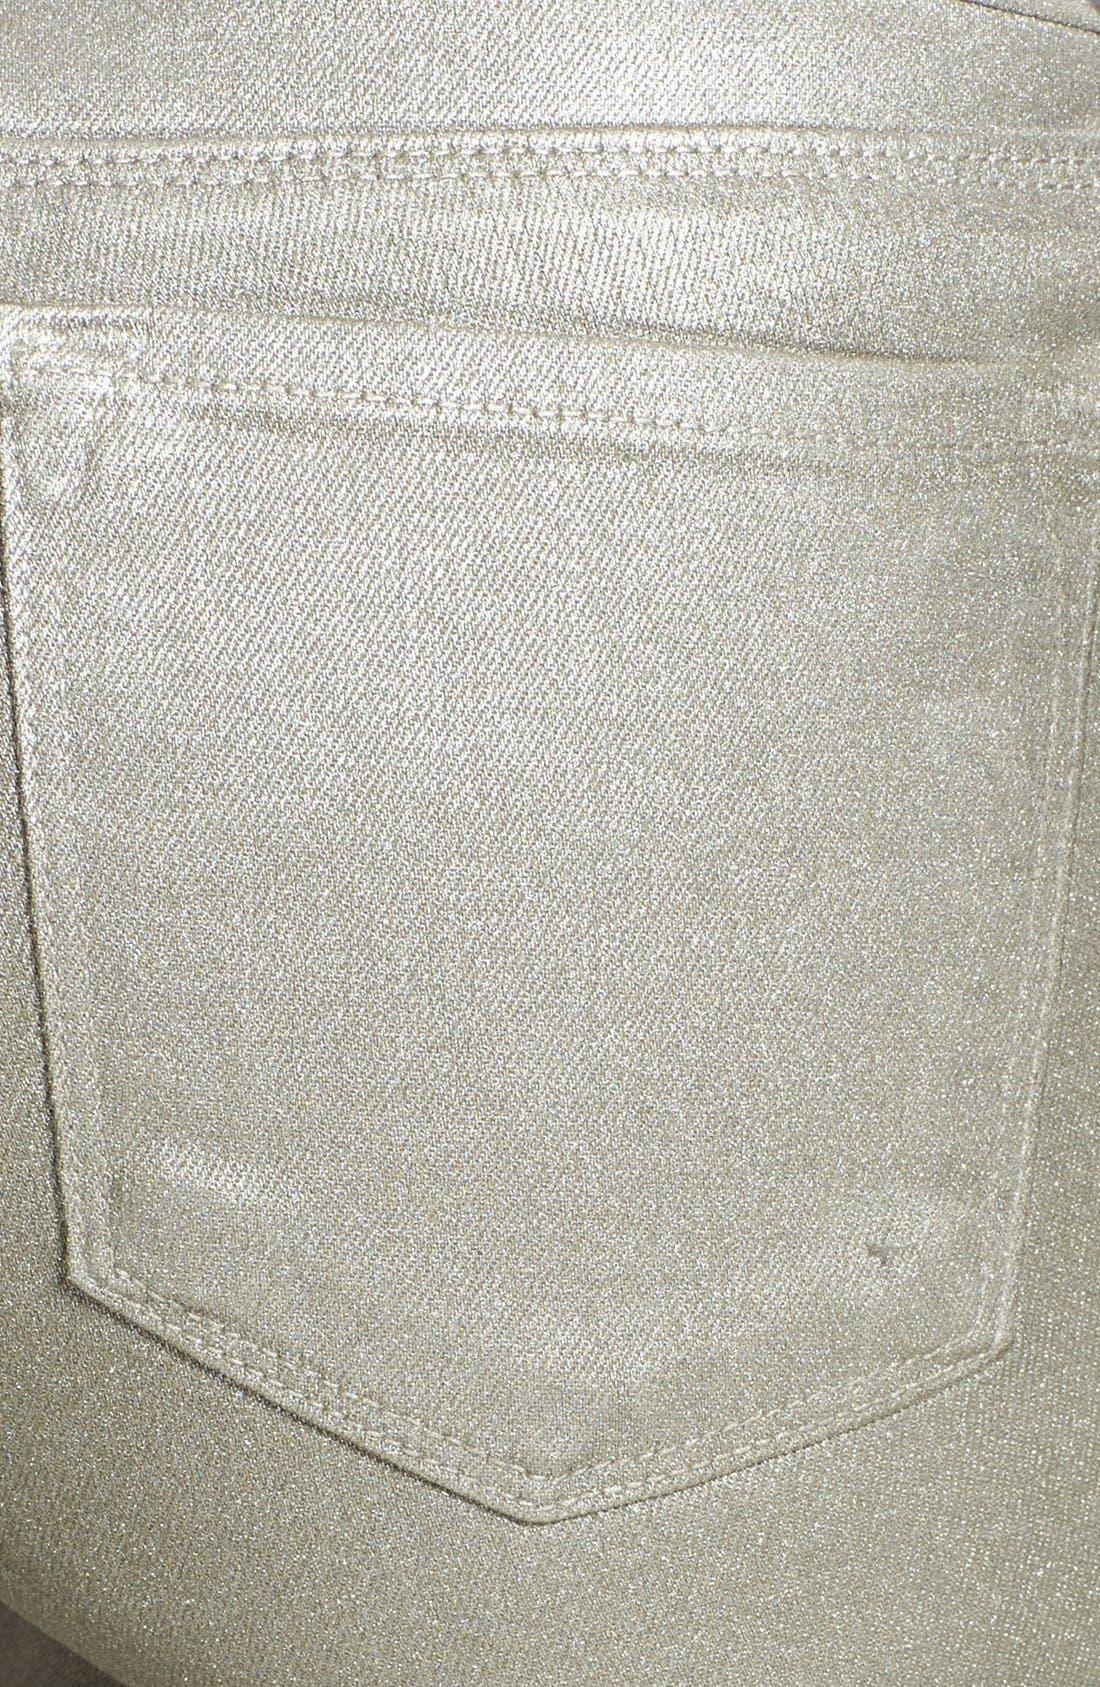 '485' Skinny Jeans,                             Alternate thumbnail 3, color,                             040